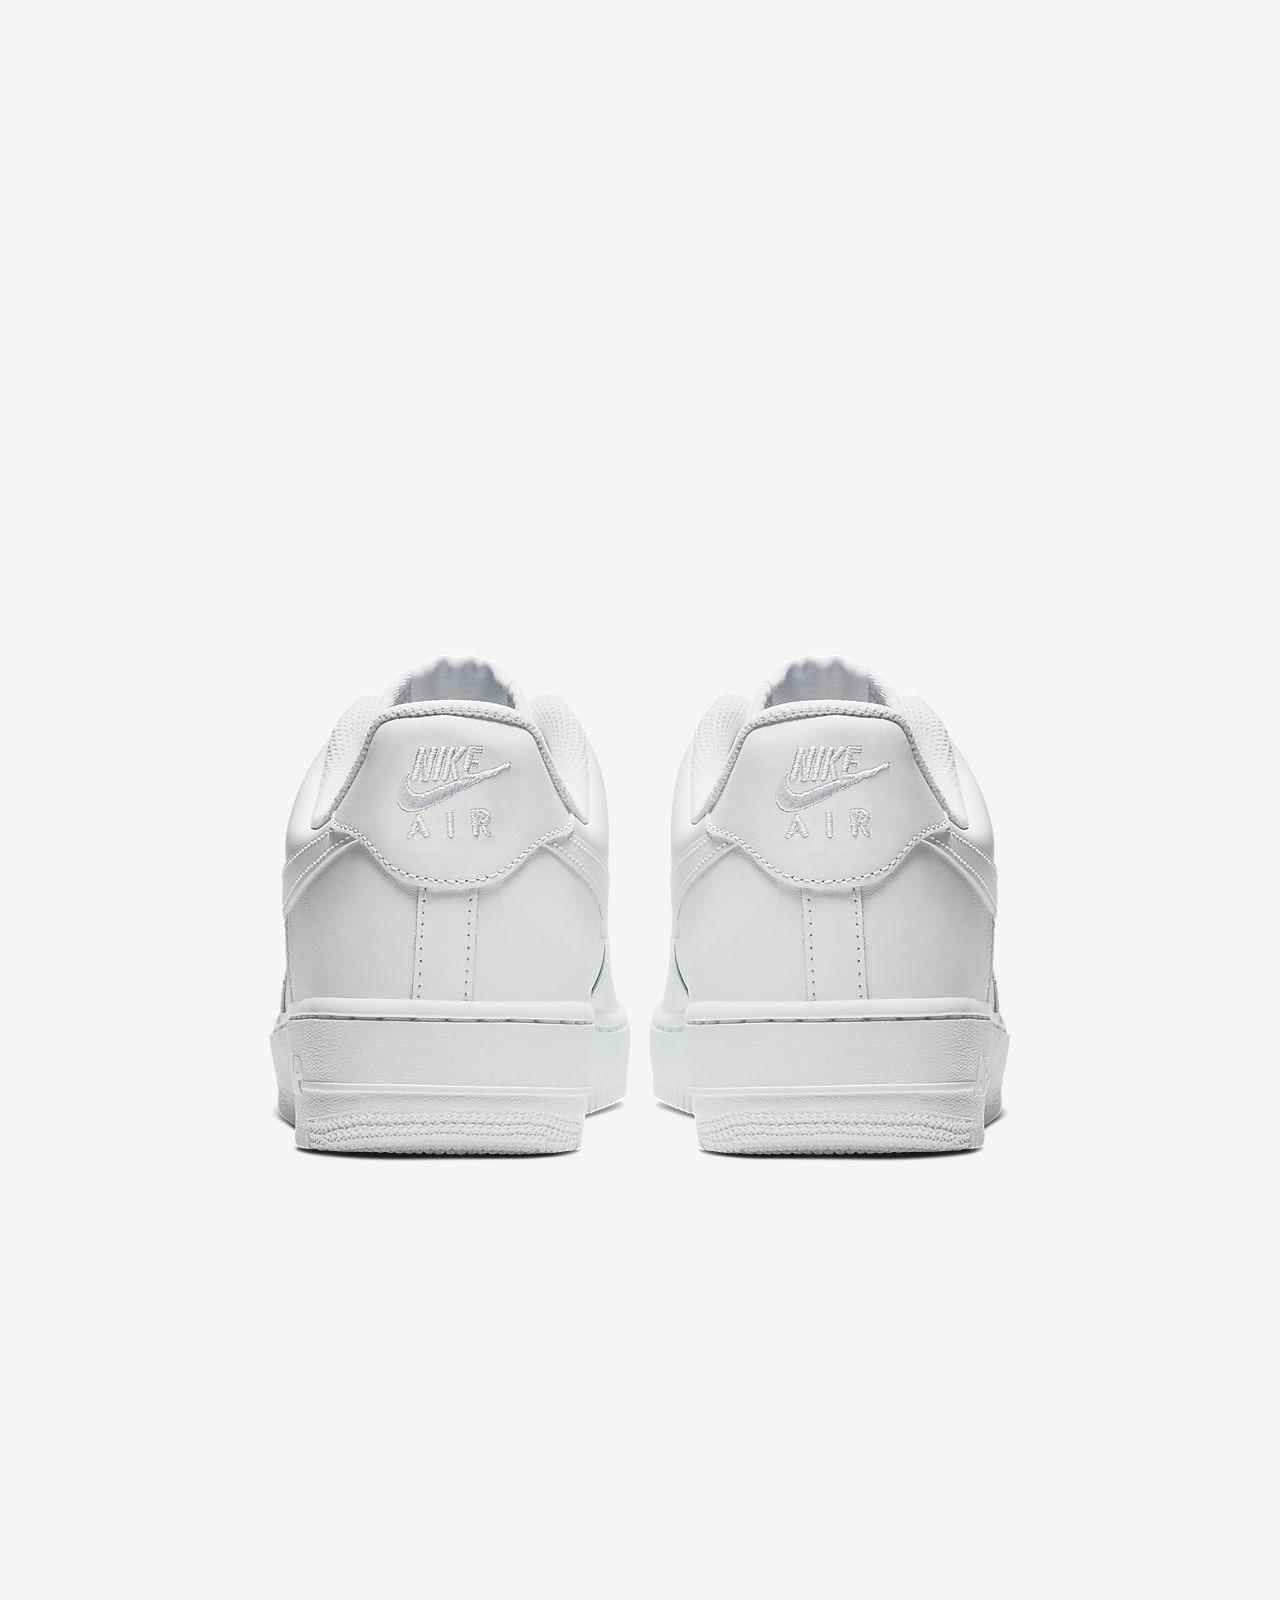 83b6414abd16 Nike Air Force 1  07 Shoe. Nike.com GB